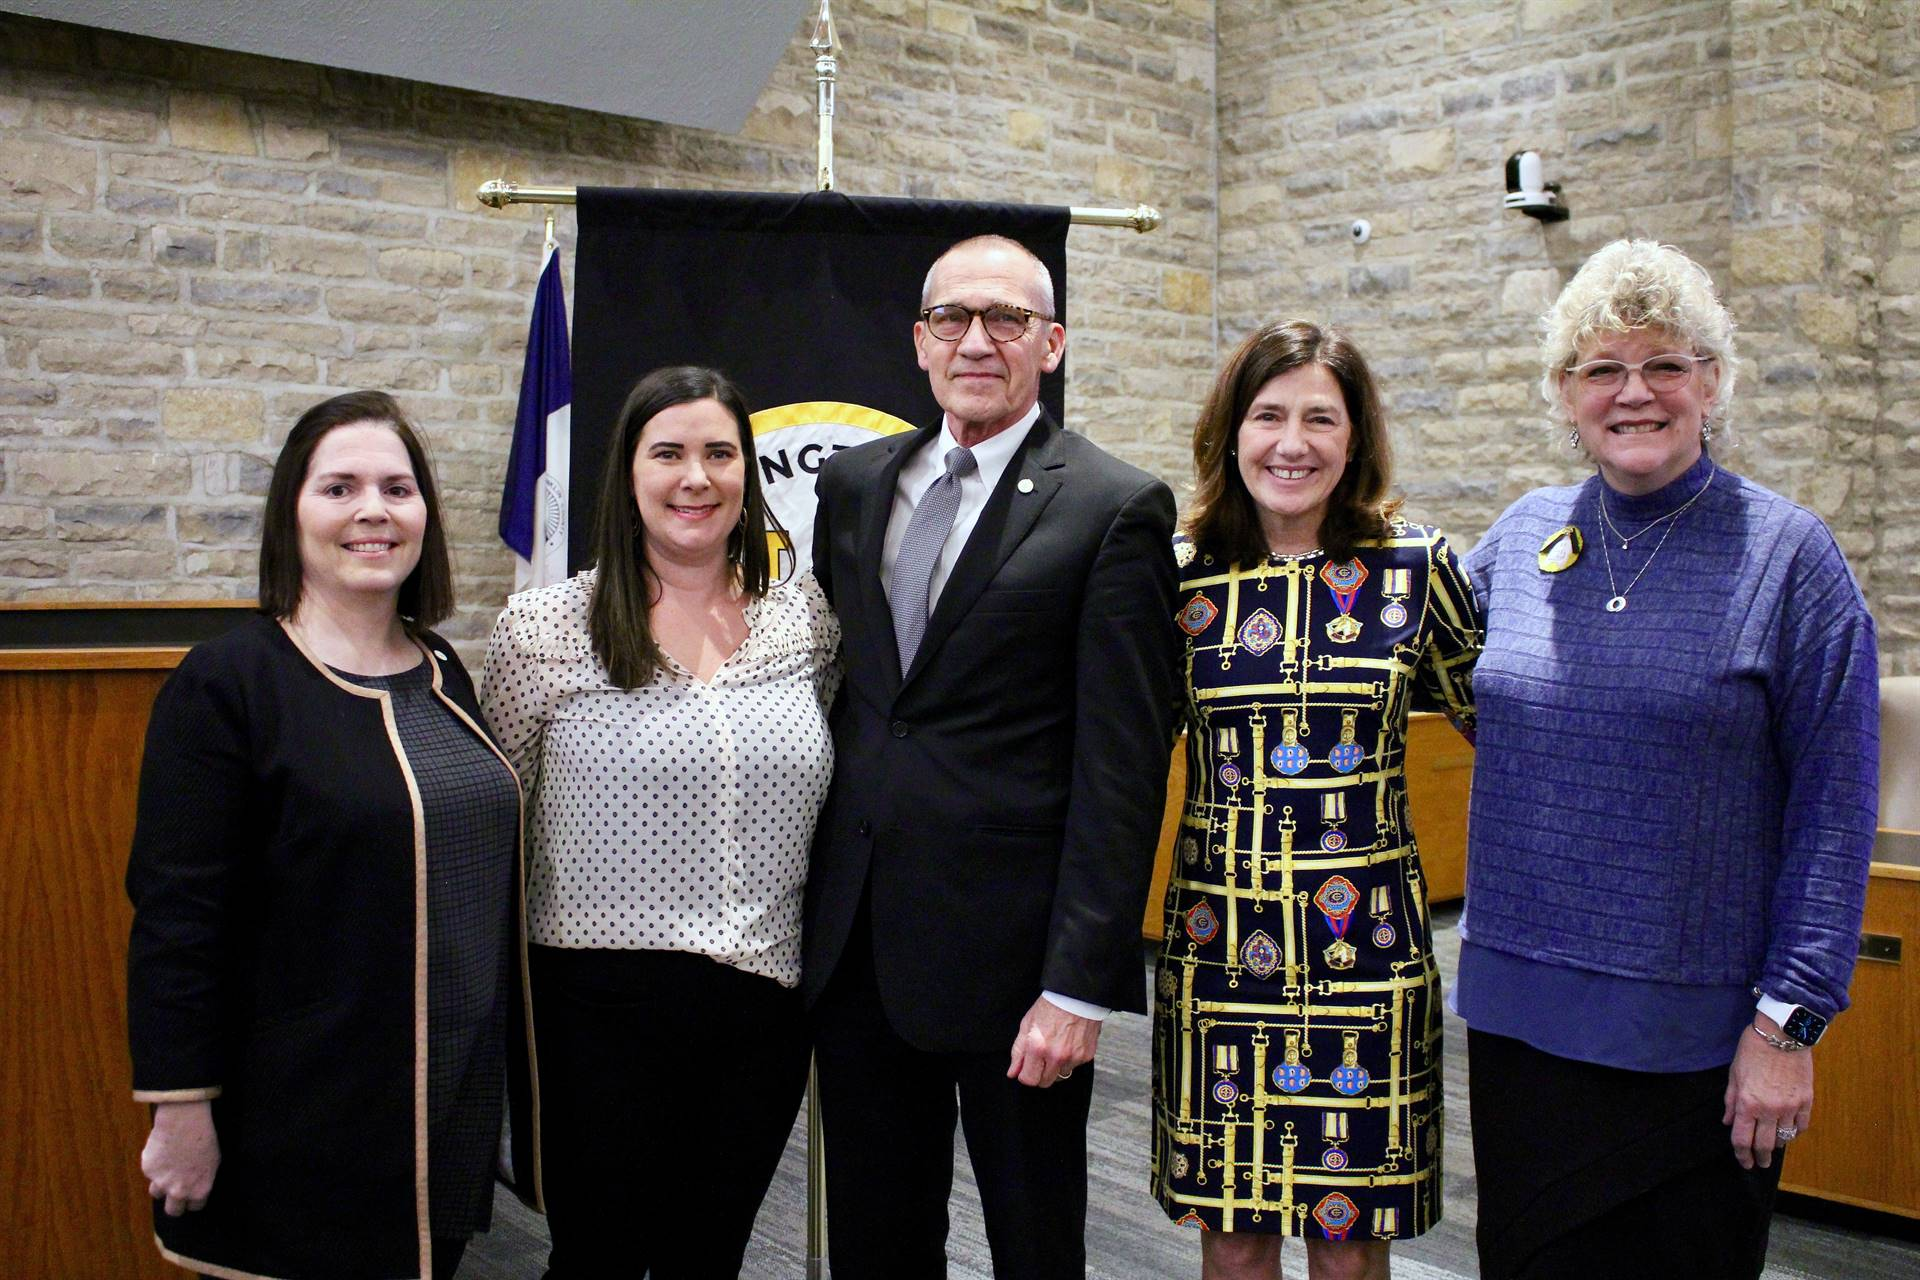 The members of the Upper Arlington Board of Education